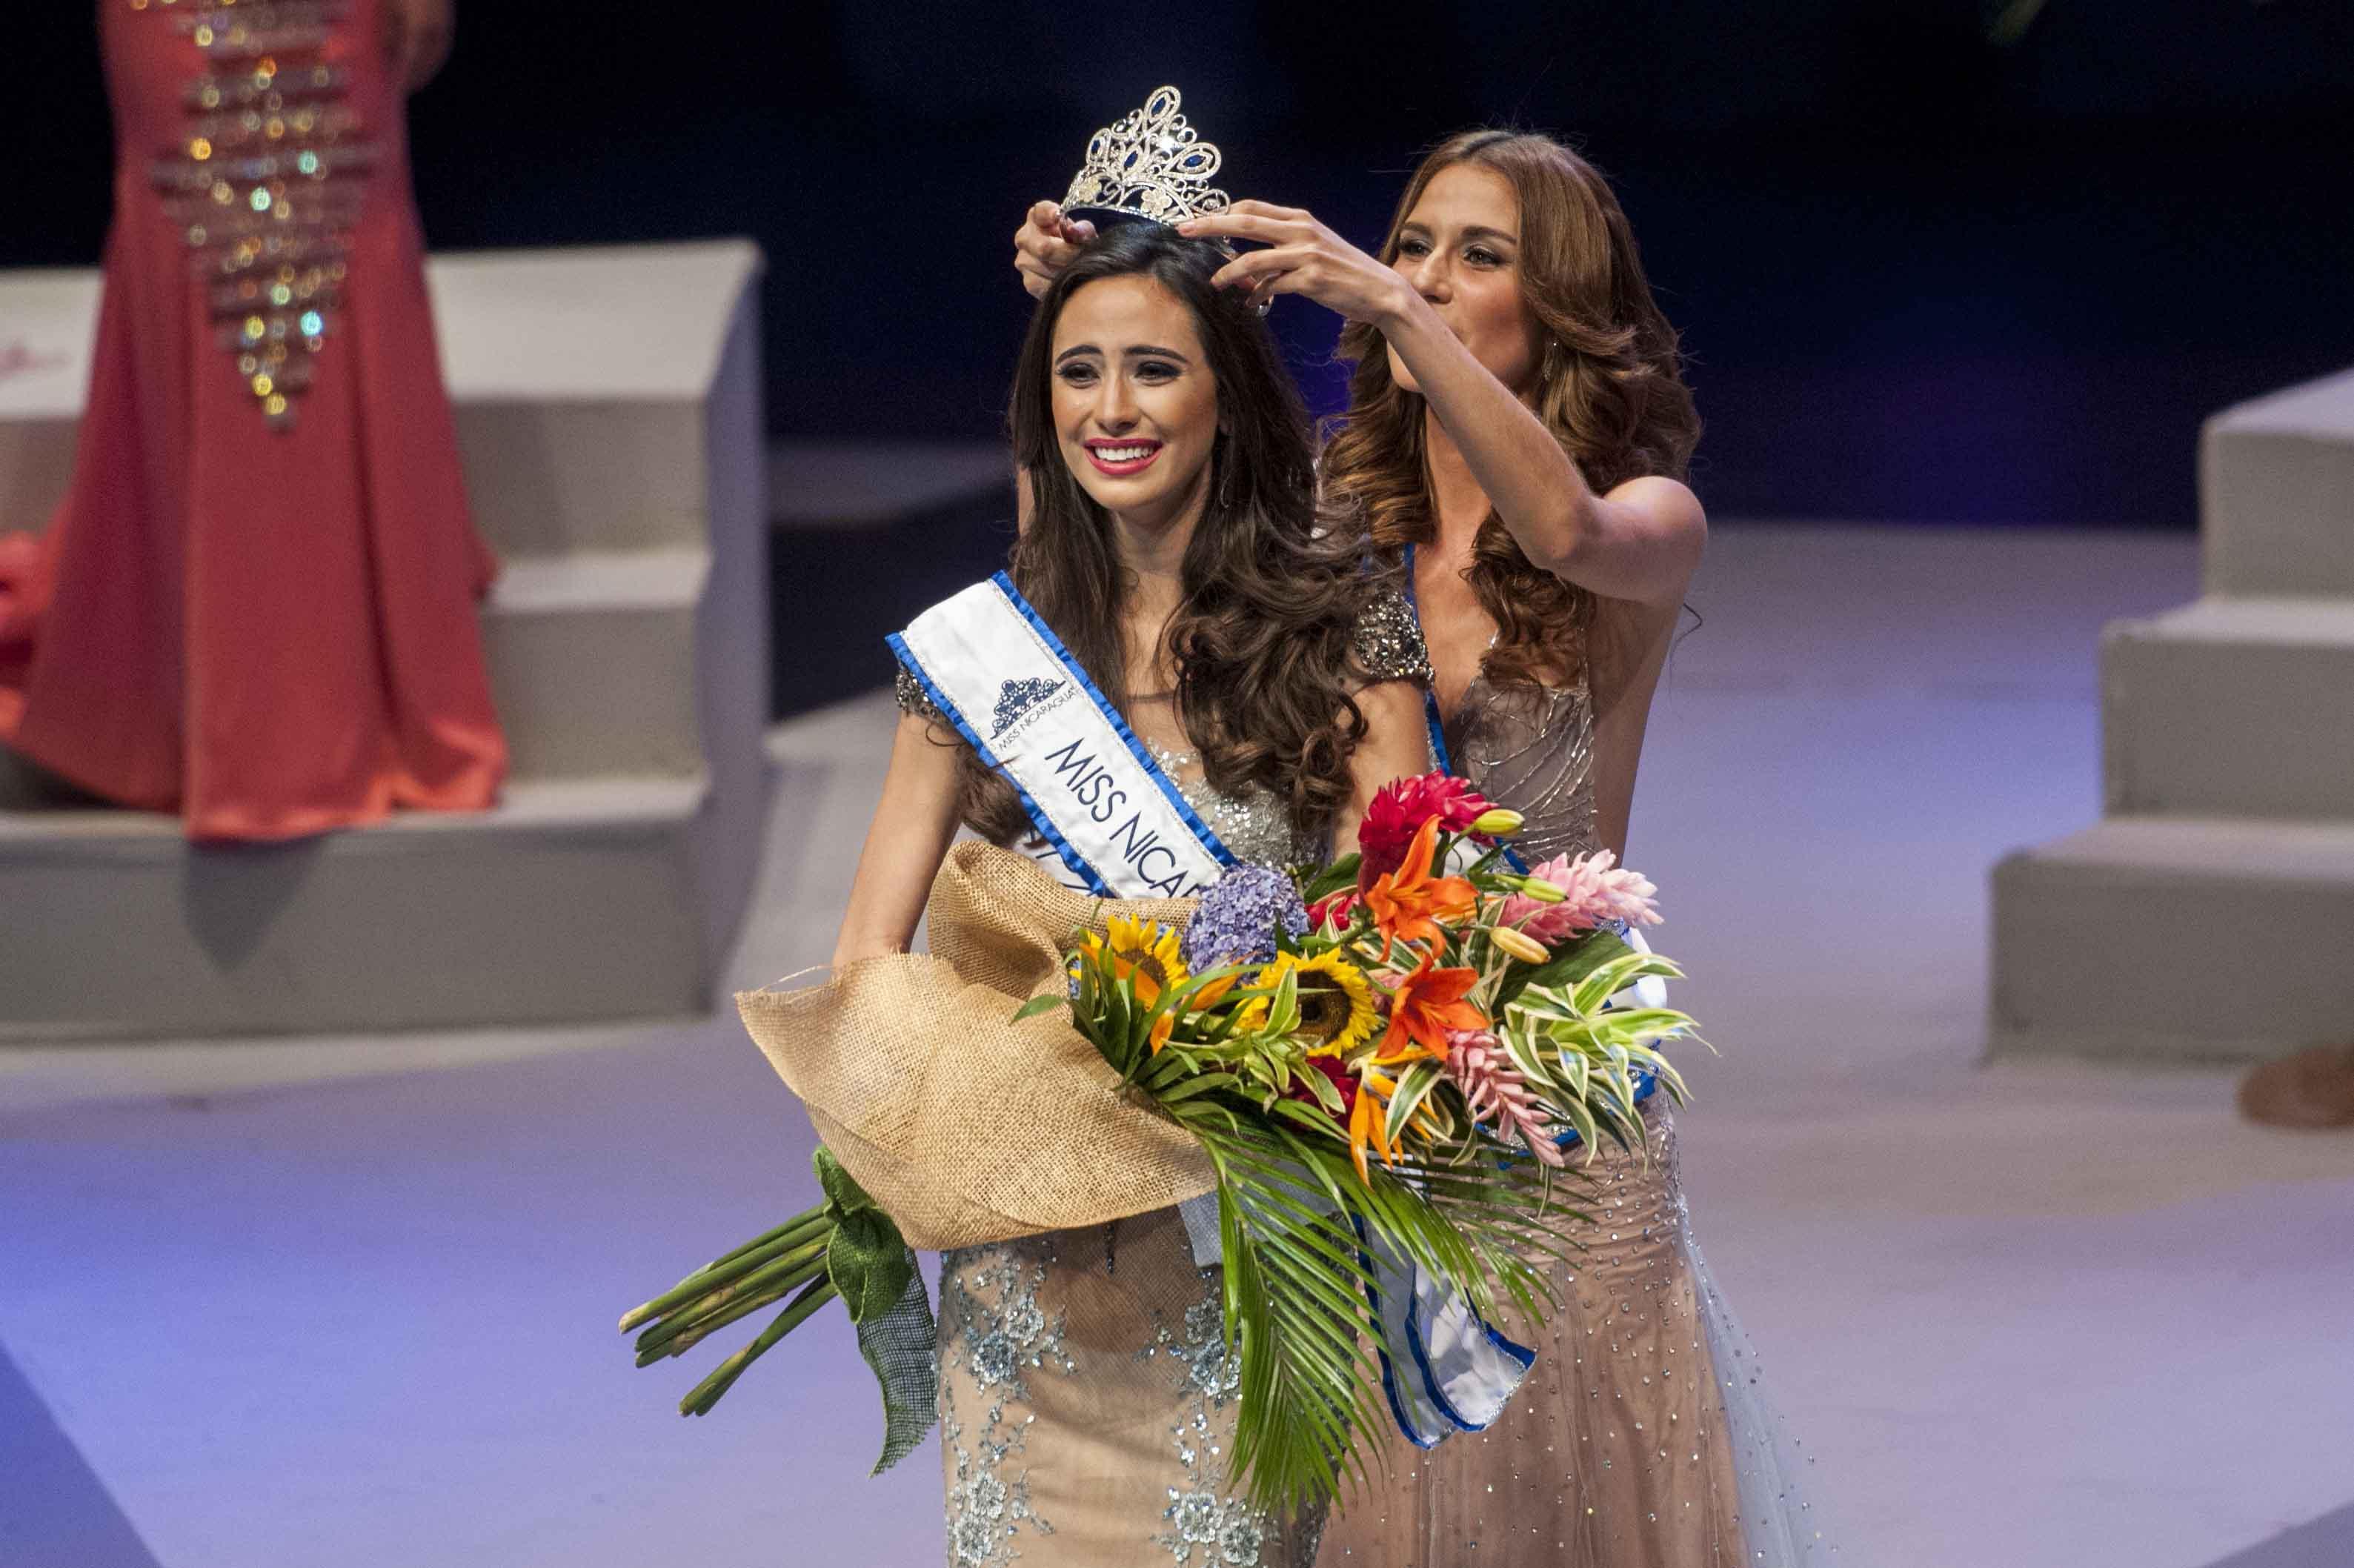 Marina Jacoby Wins Miss Nicaragua 2016: Miss Nicaragua Busca #MujeresPenconas